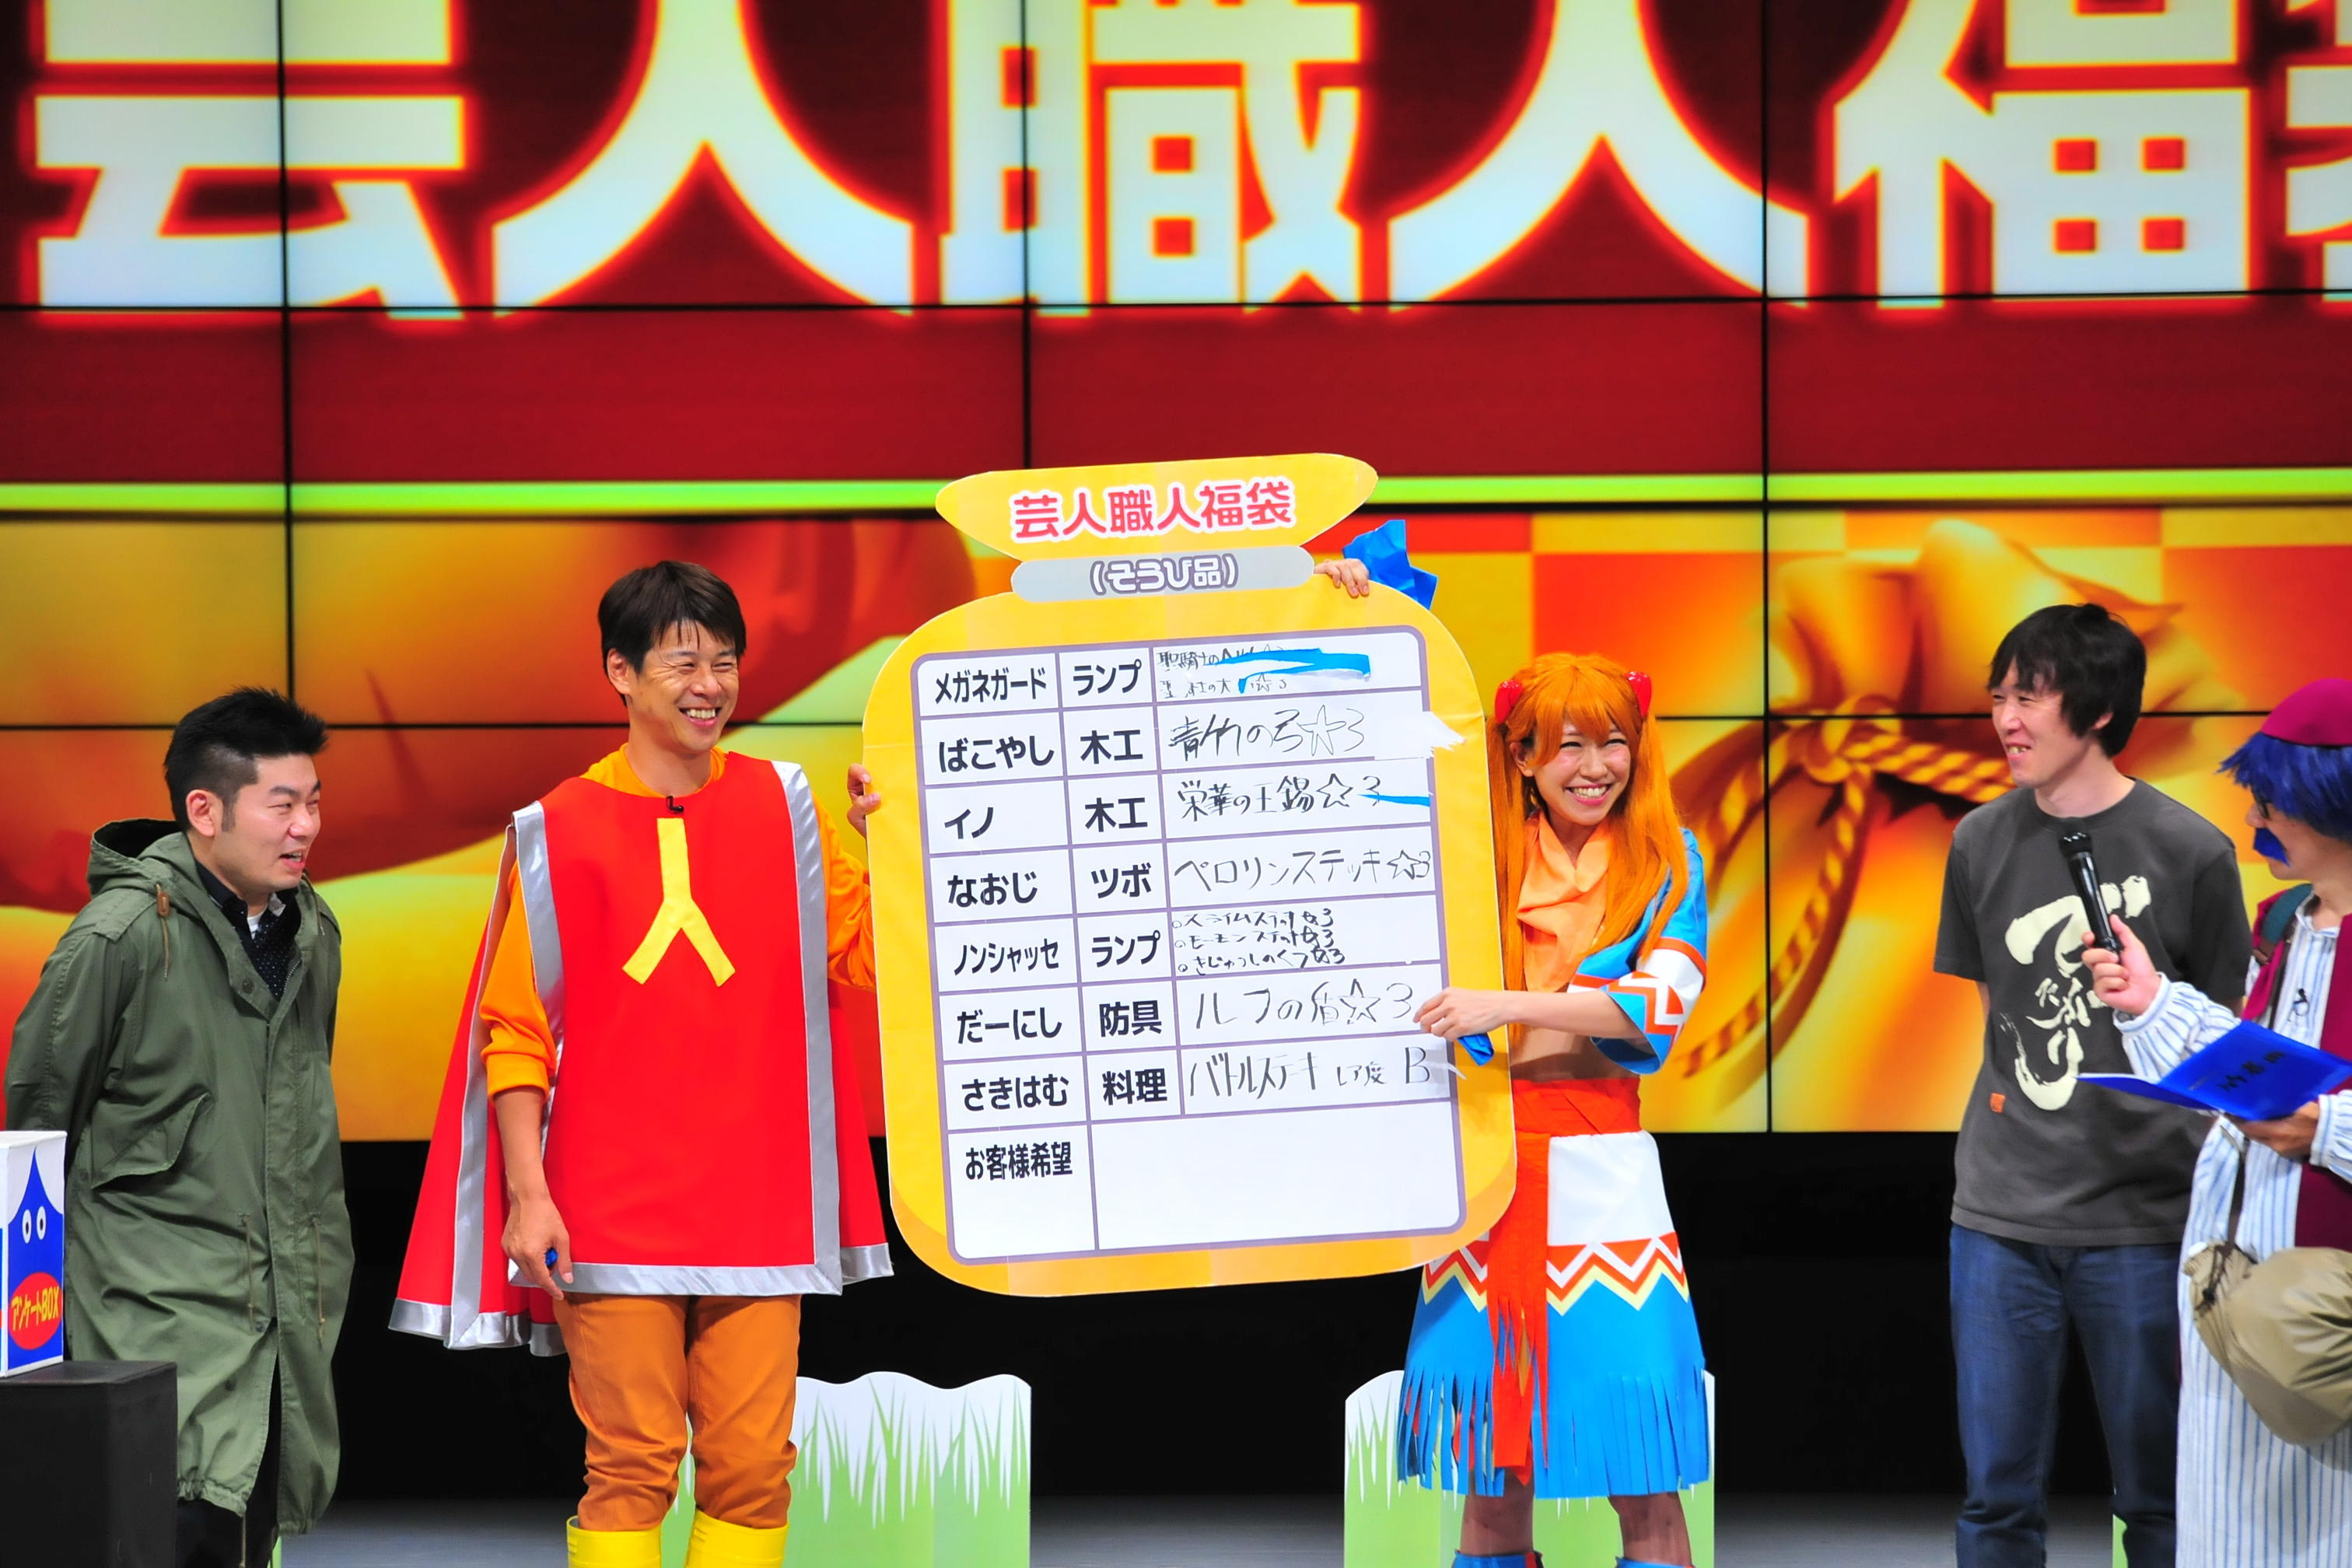 http://news.yoshimoto.co.jp/20160613100503-8c89230663a032d181b9faee62e20bcea8be85df.jpg